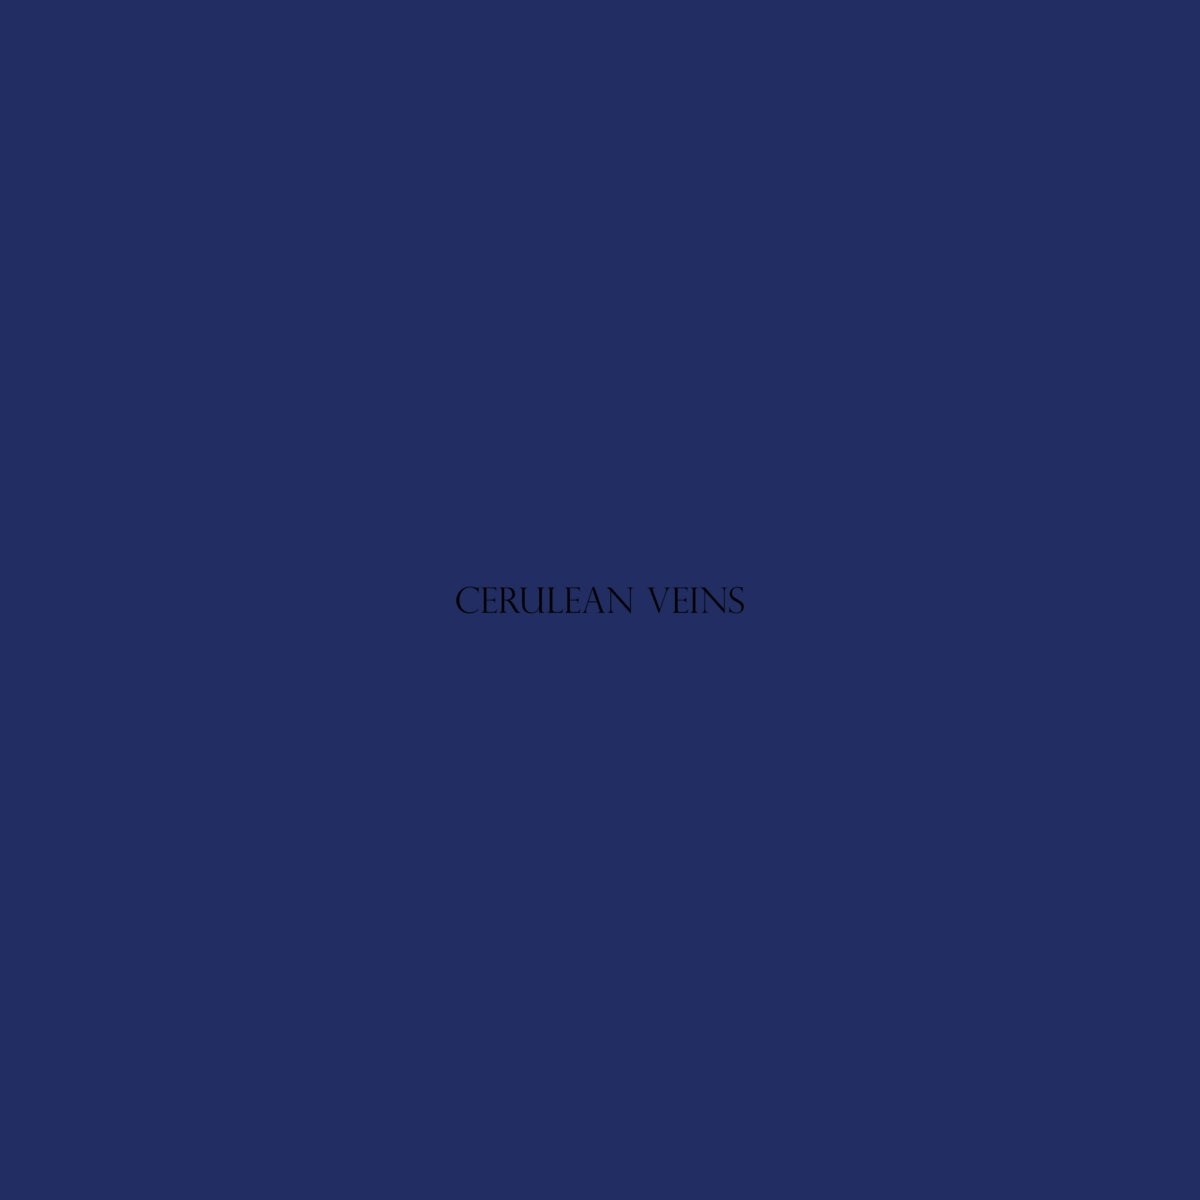 Cerulean Veins - Blue